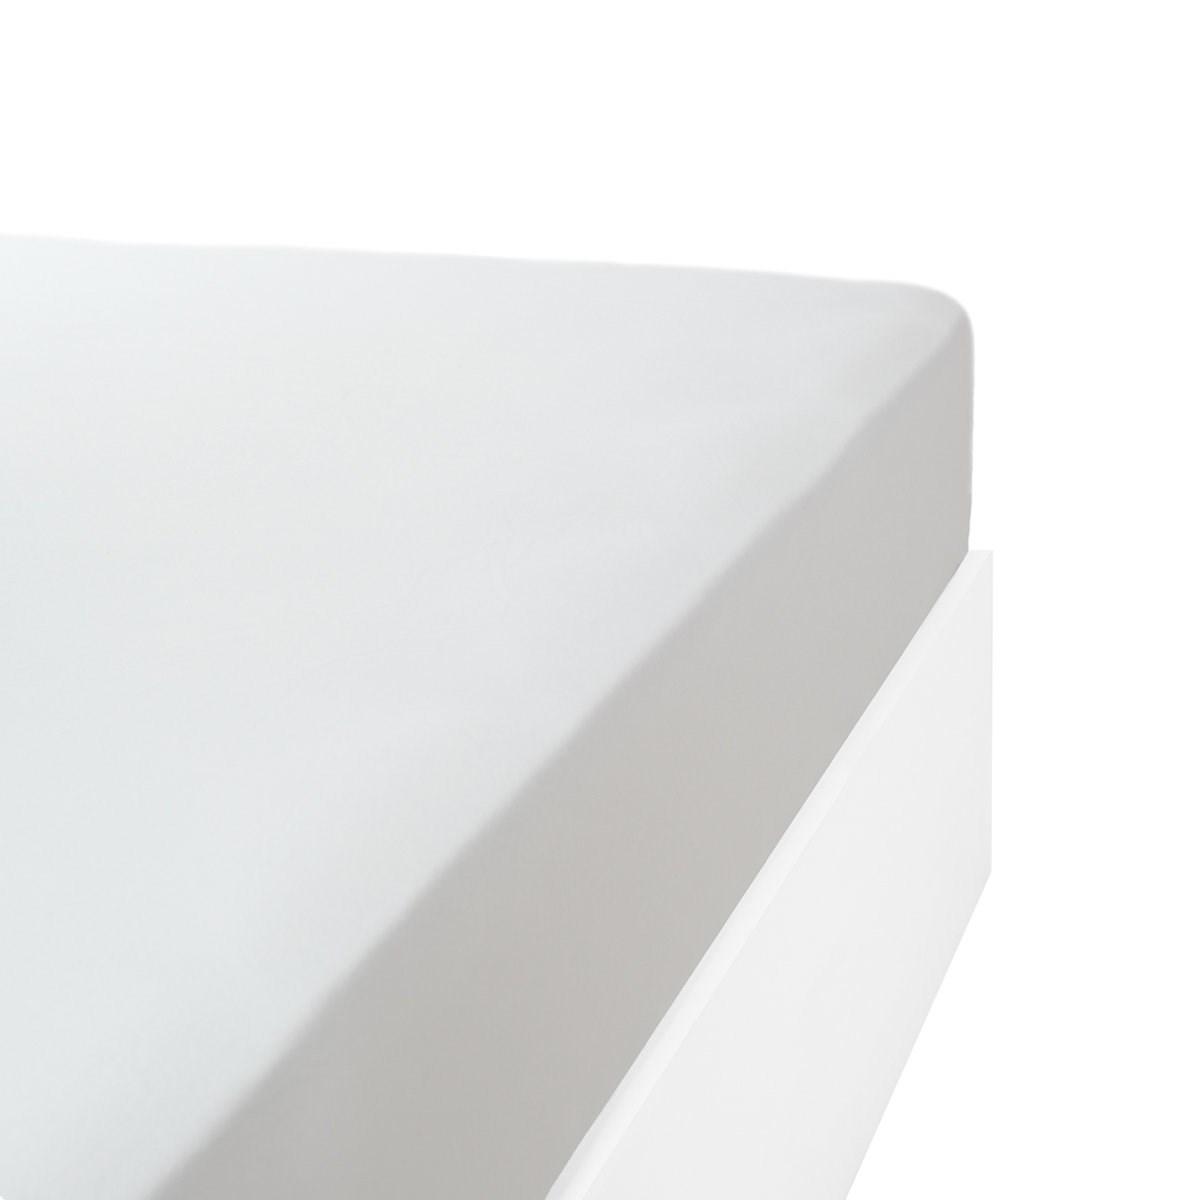 Drap housse jersey extensible en coton blanc 100x200 cm